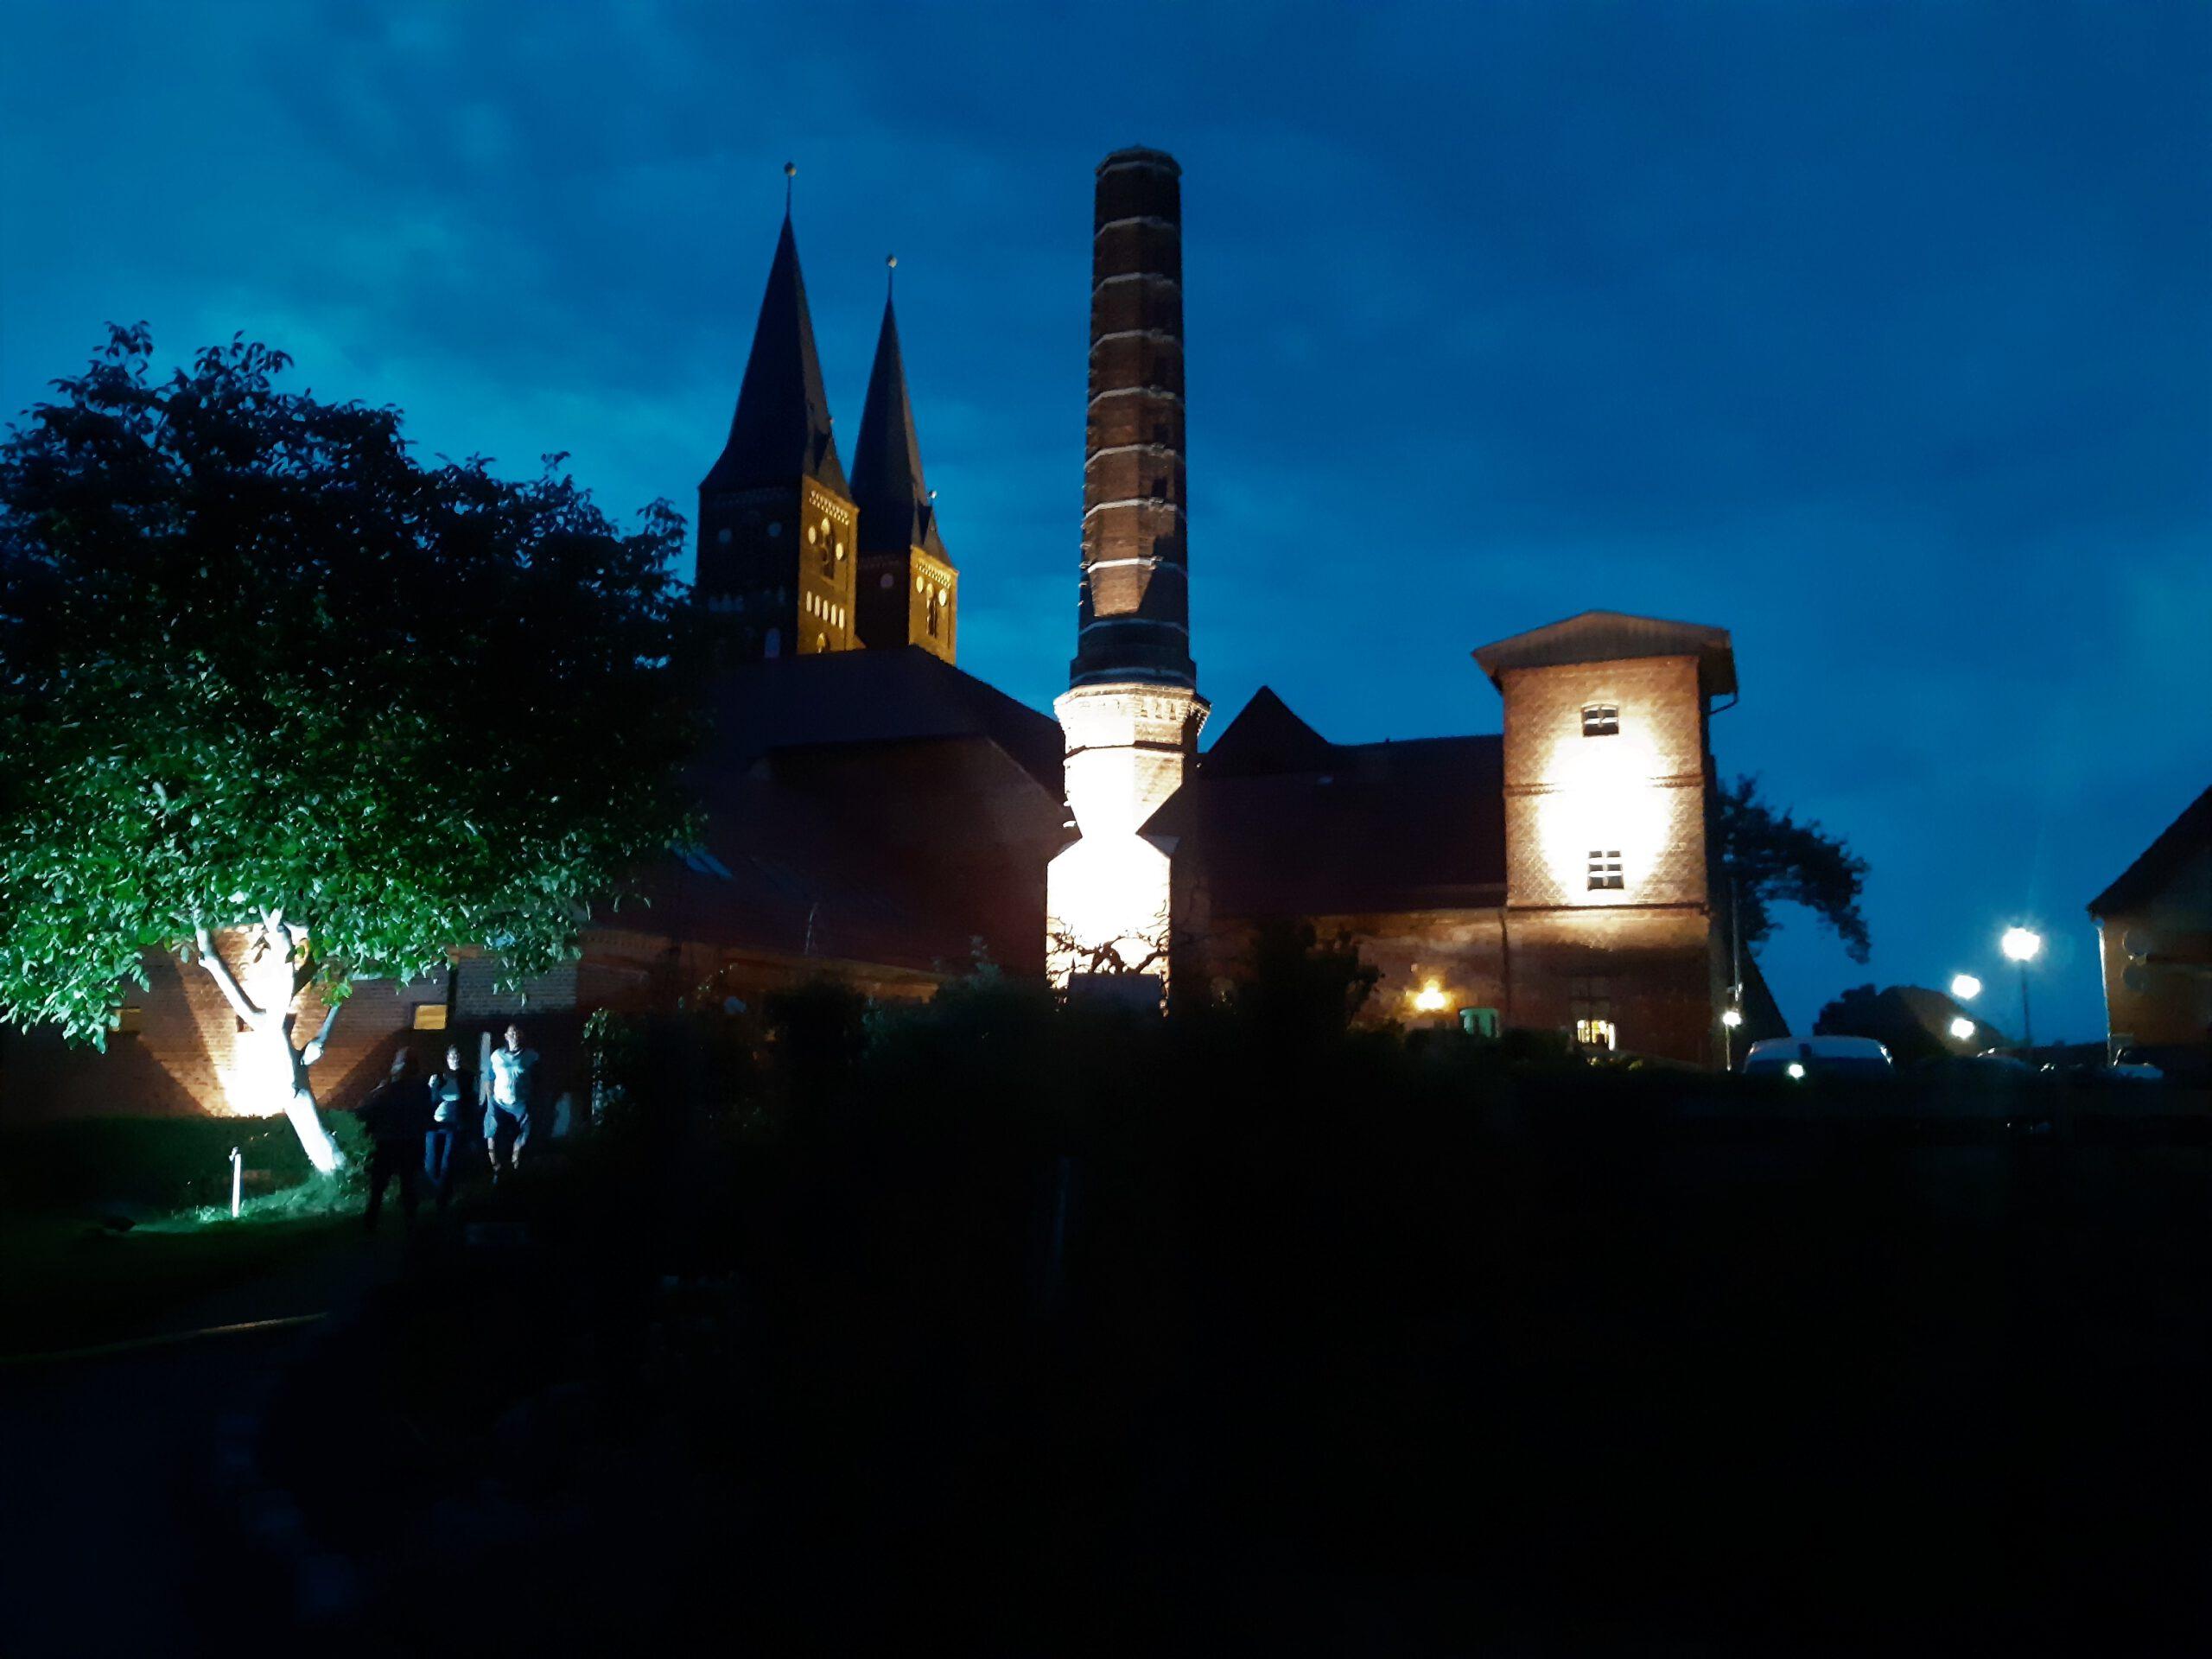 Kloster Jerichow bei Nacht